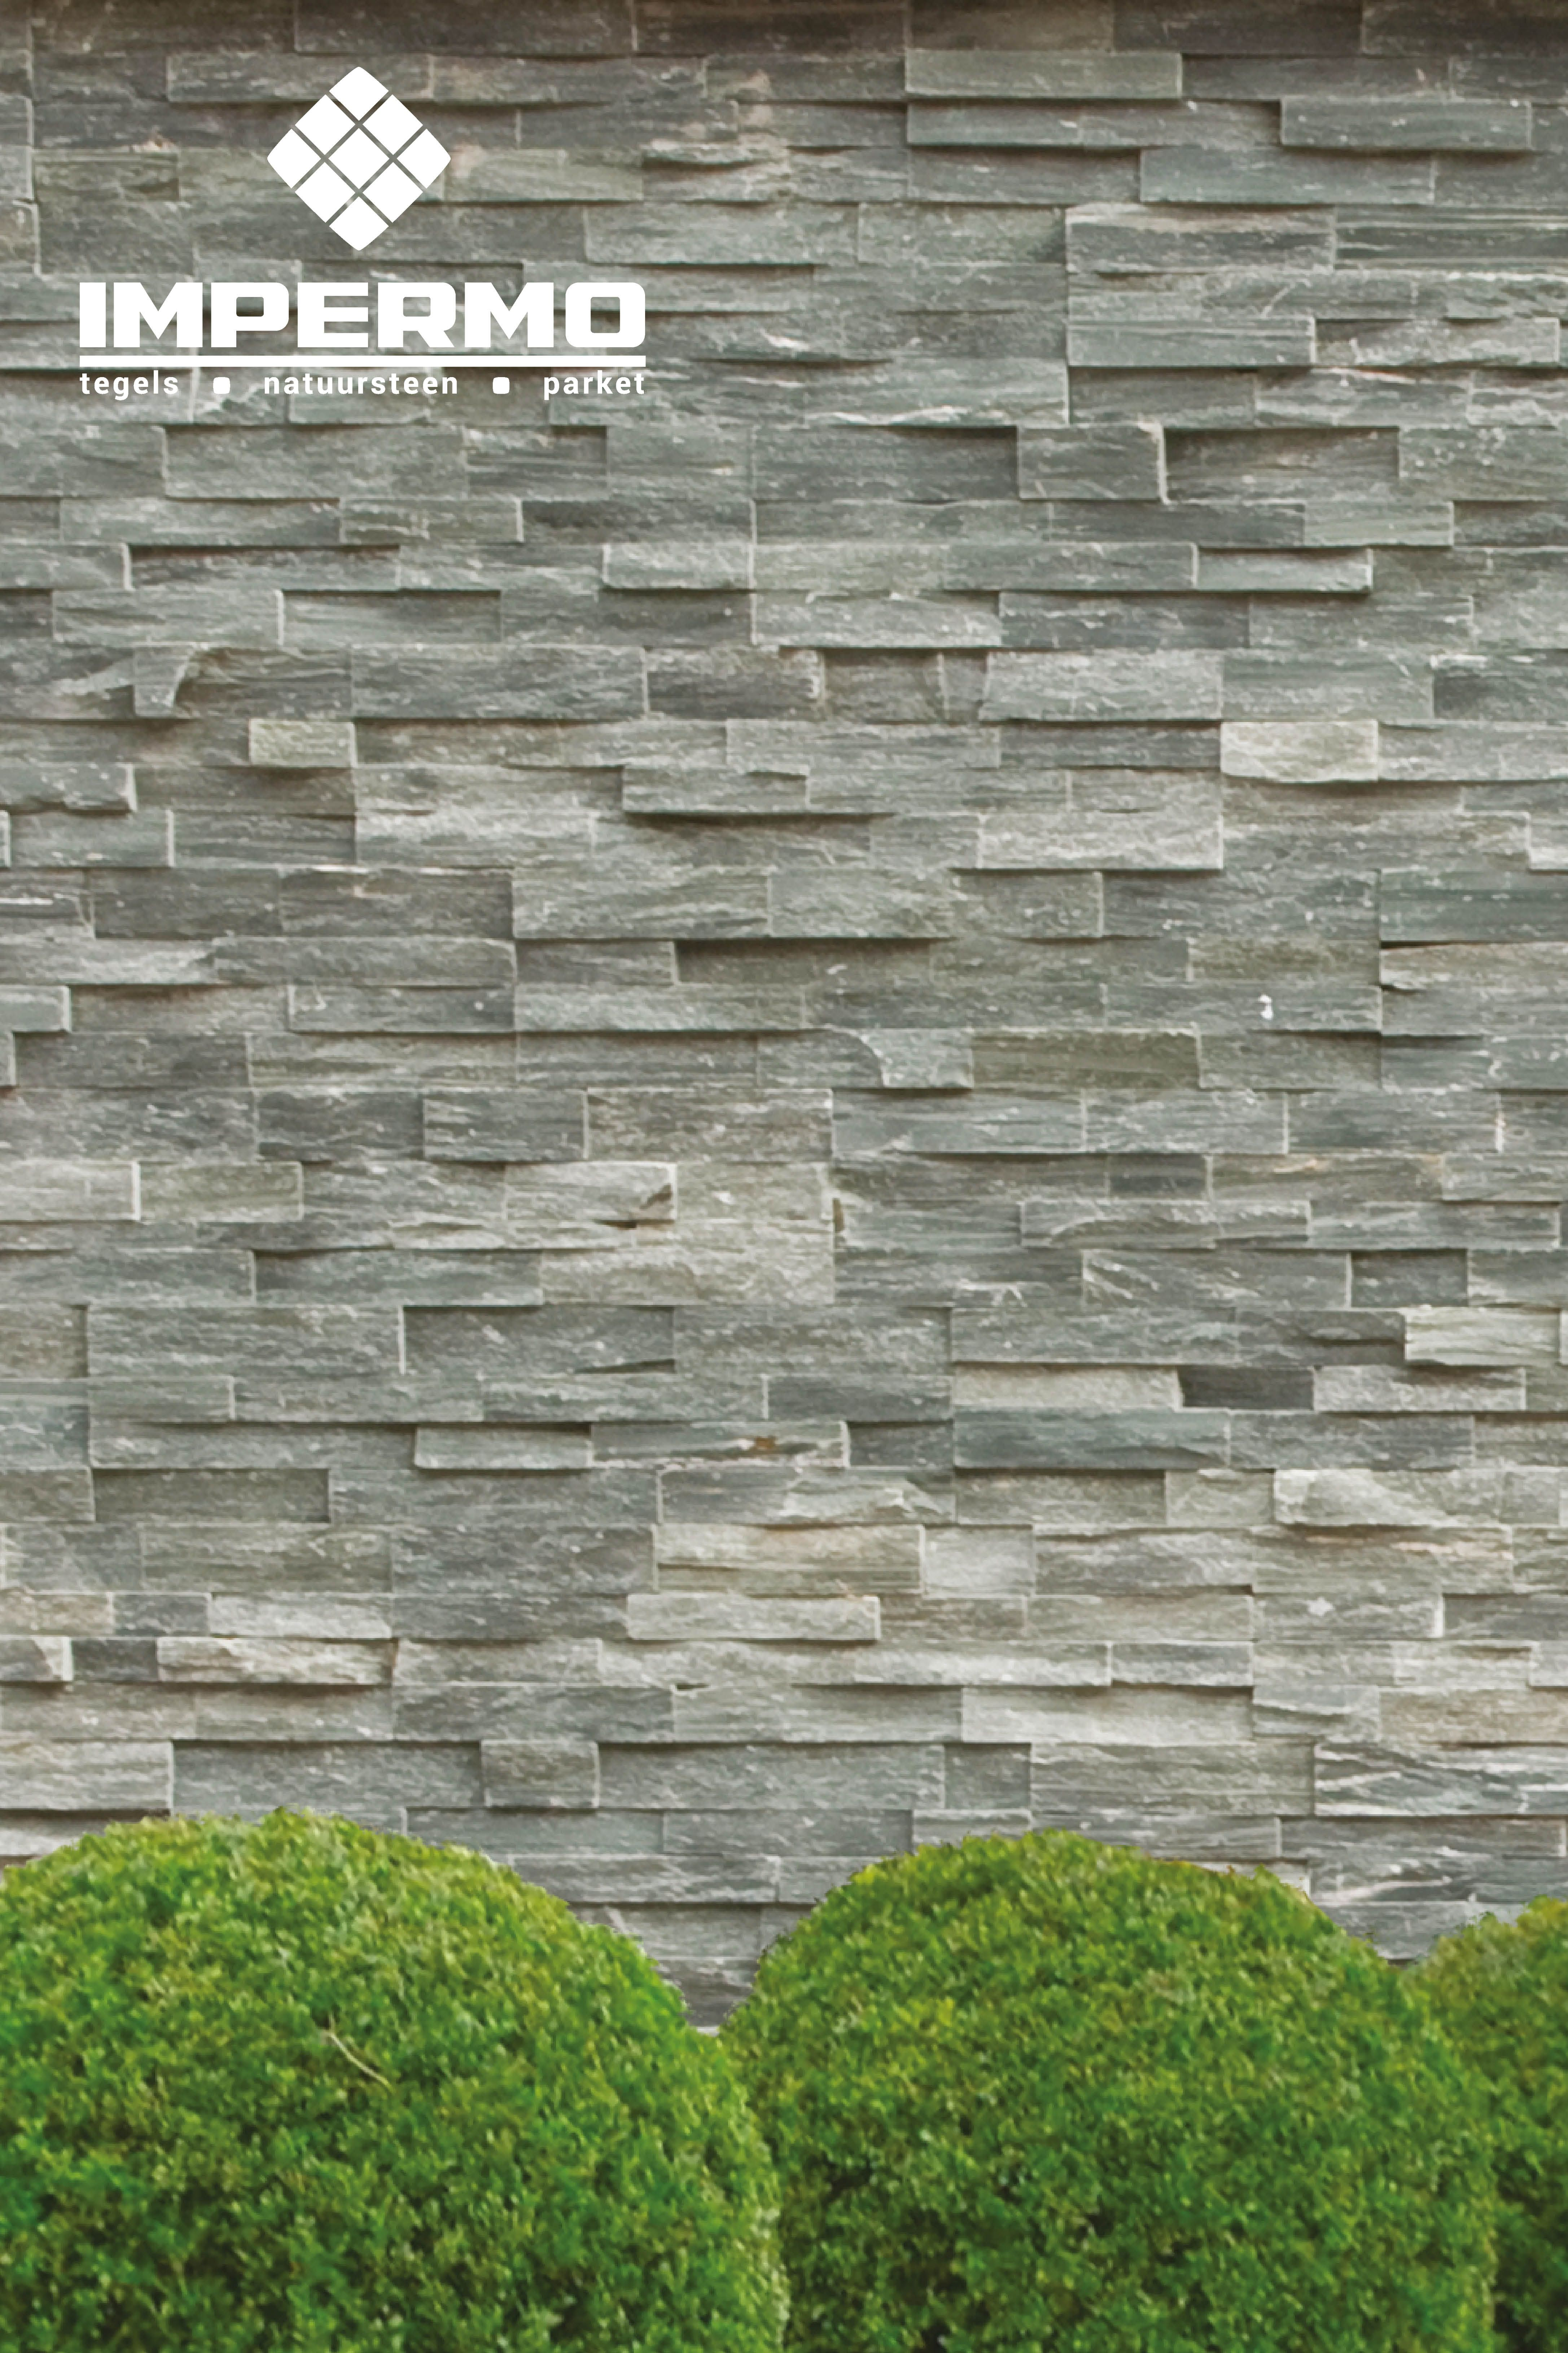 Beste Cliffstone - Wandtegels - Natuursteen strips | Impermo : tegels TO-03